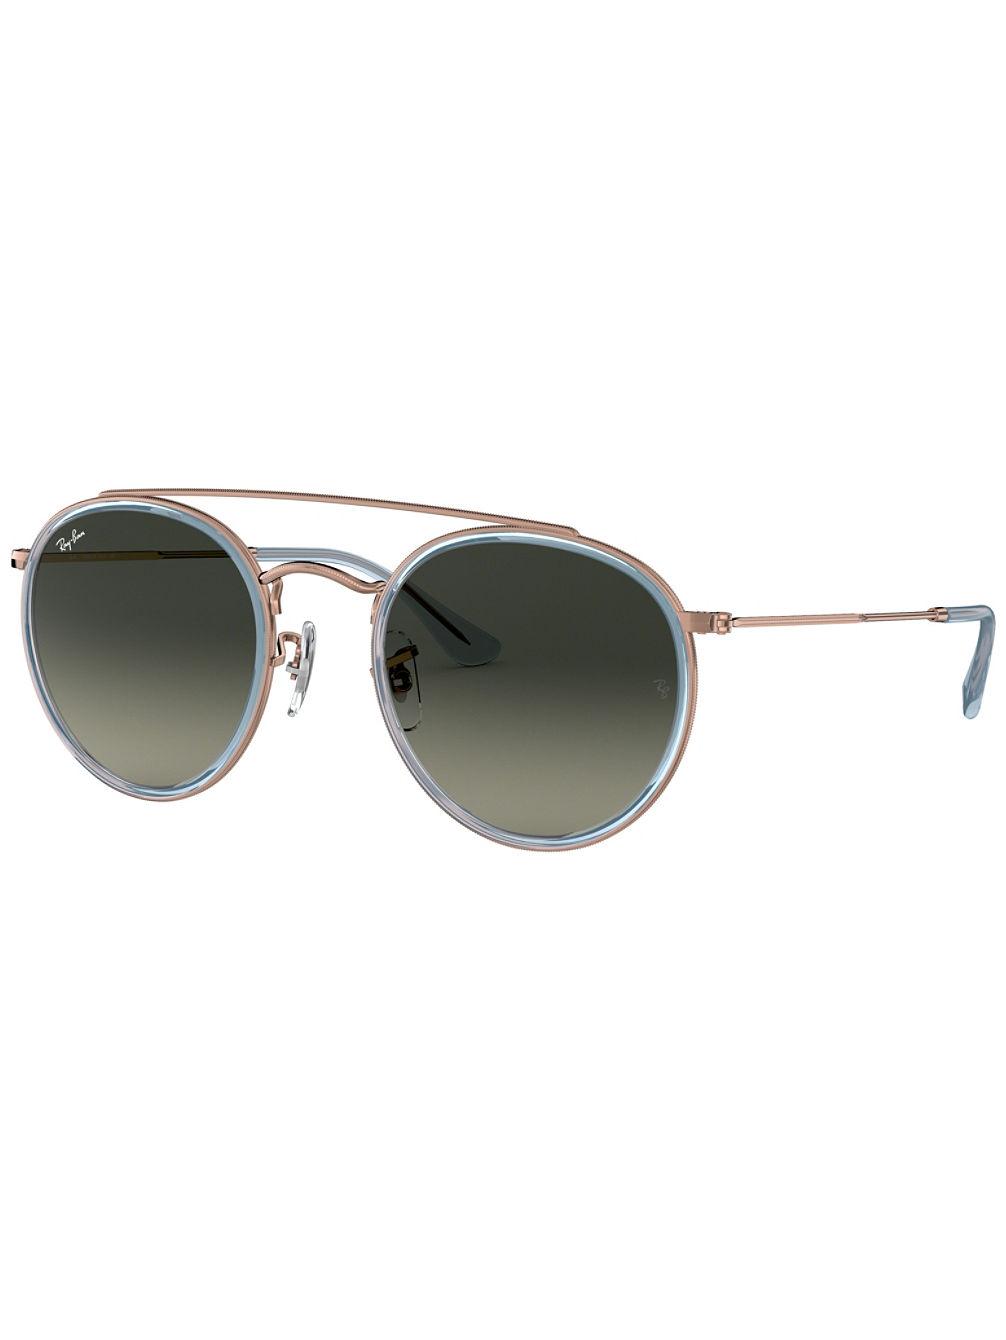 Köp Ray Ban Round Double Bridge Copper Solglasögon online på blue ... 35810f3696501